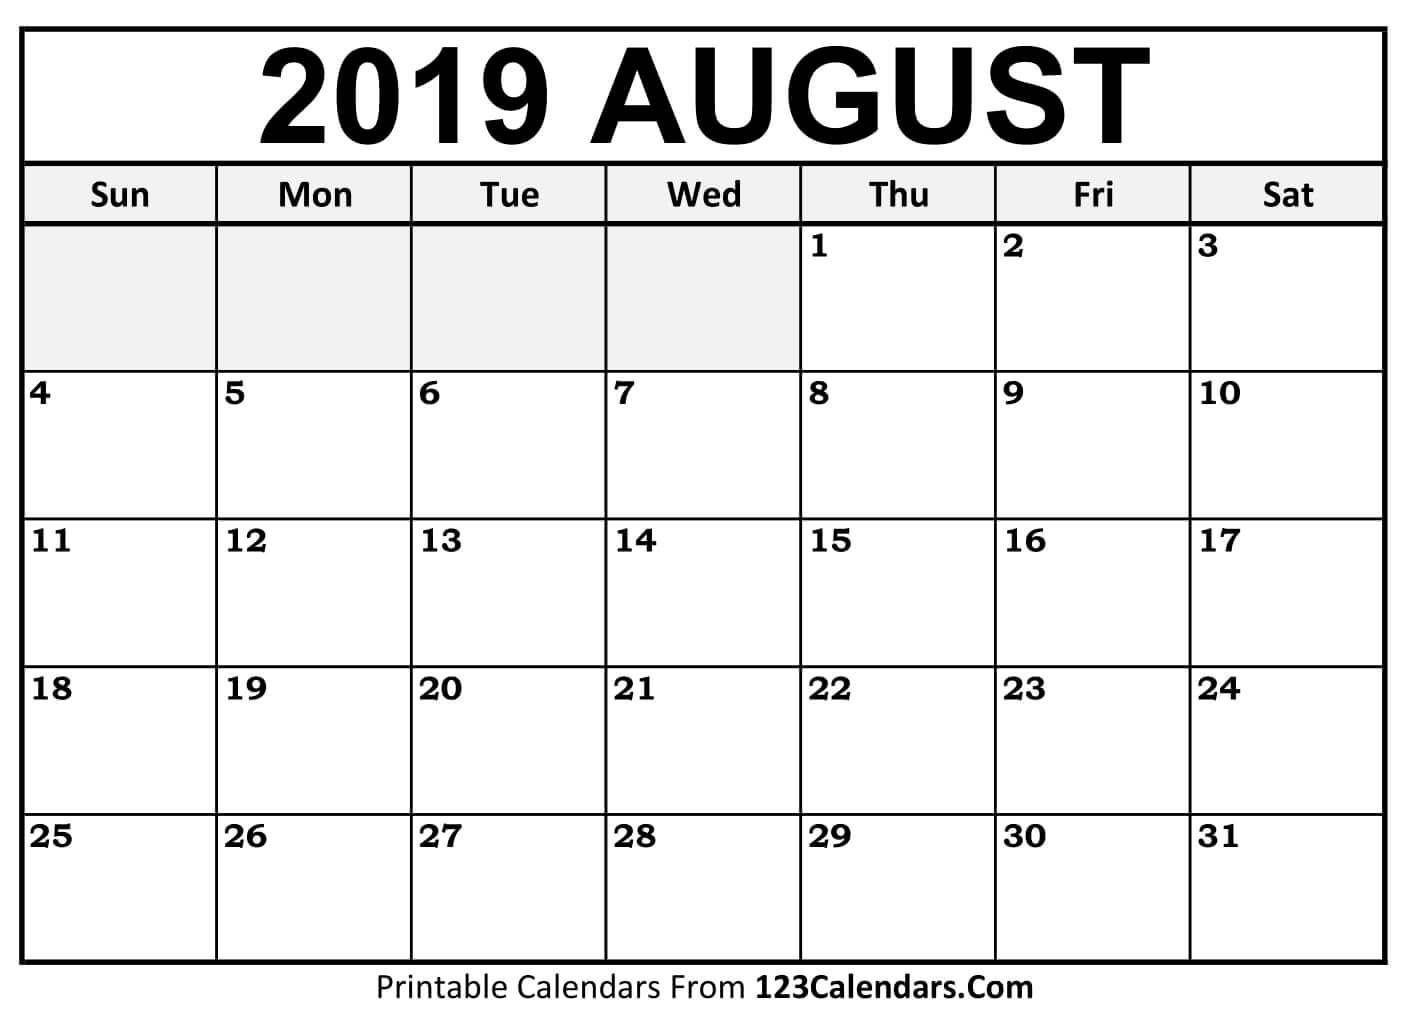 Month Of August 2019 Printable Calendar   Calendar Template in Printable Monthly Calendar Templates August